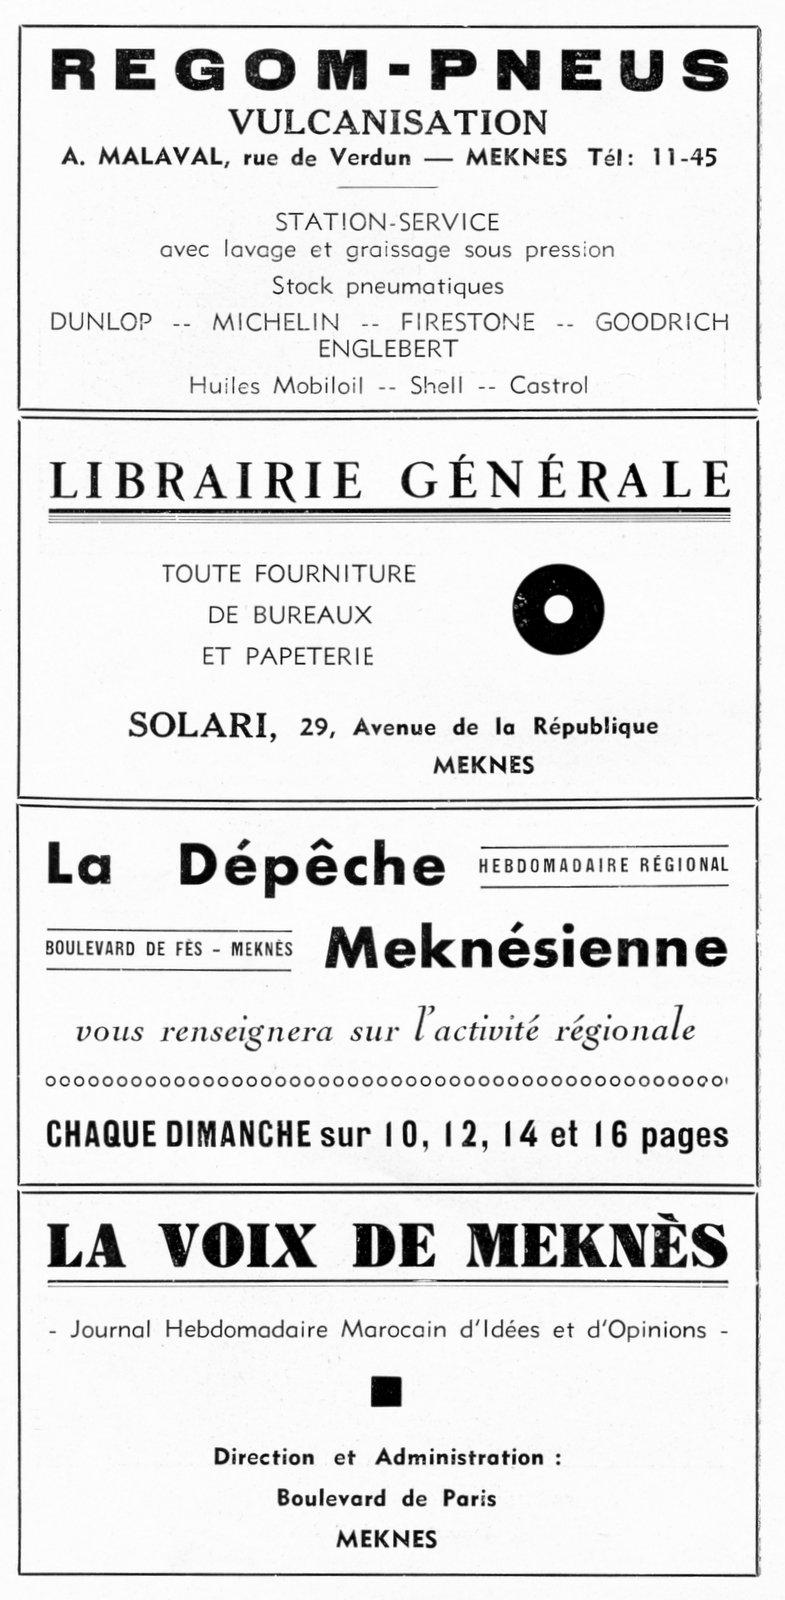 GUIDE GENERAL du MAROC - Page 8 32-gui12